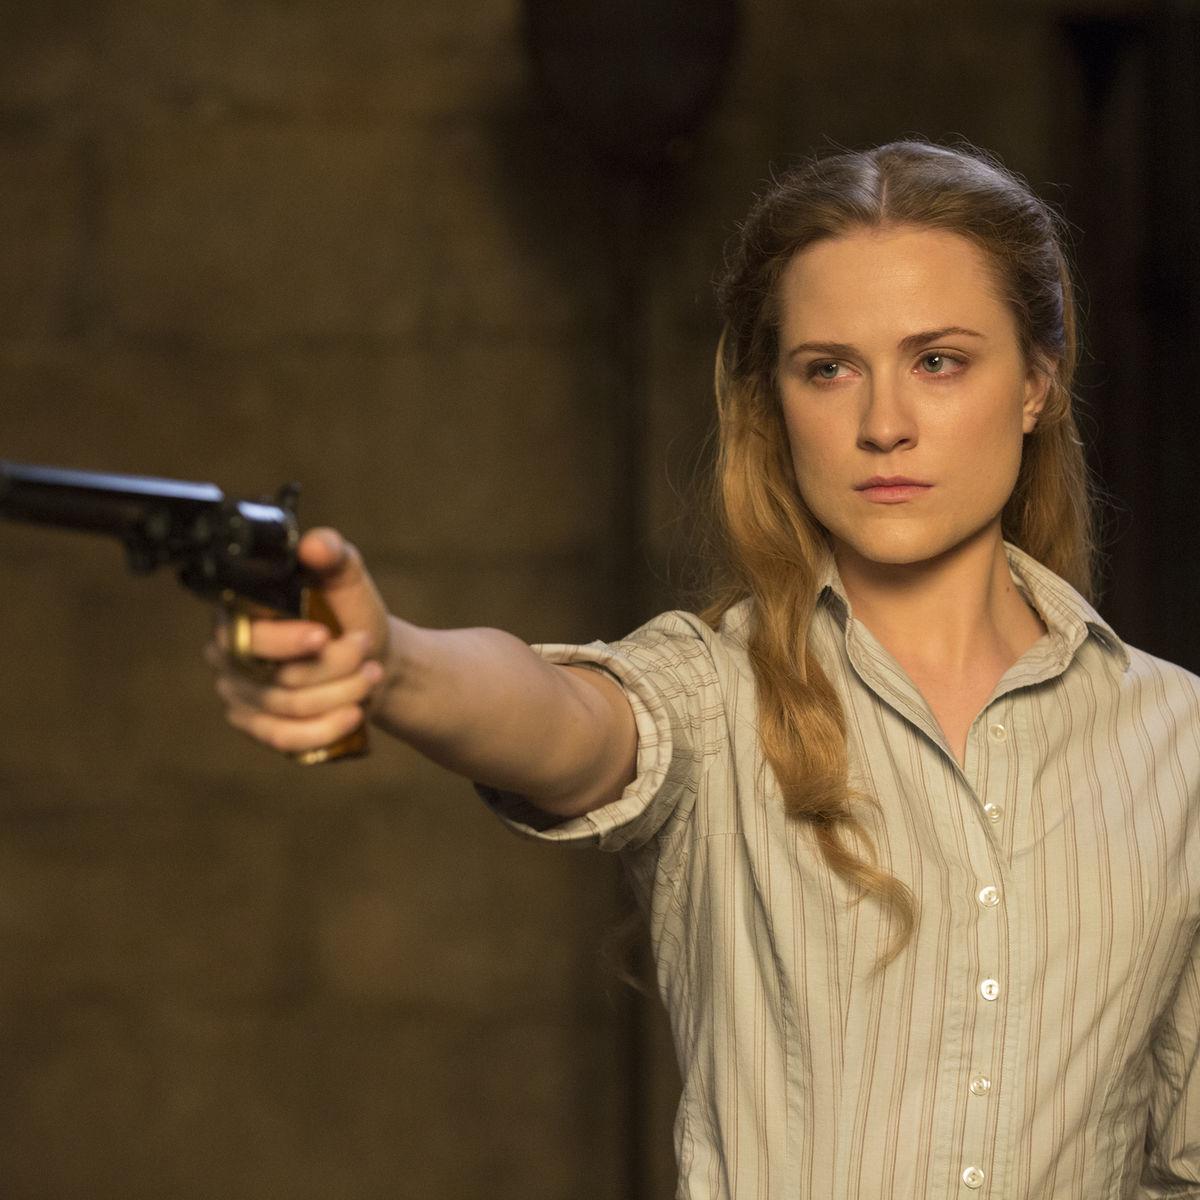 Evan_Rachel_Wood_as_Dolores_Abernathy_-_credit_John_P_Johnson_HBO.jpg